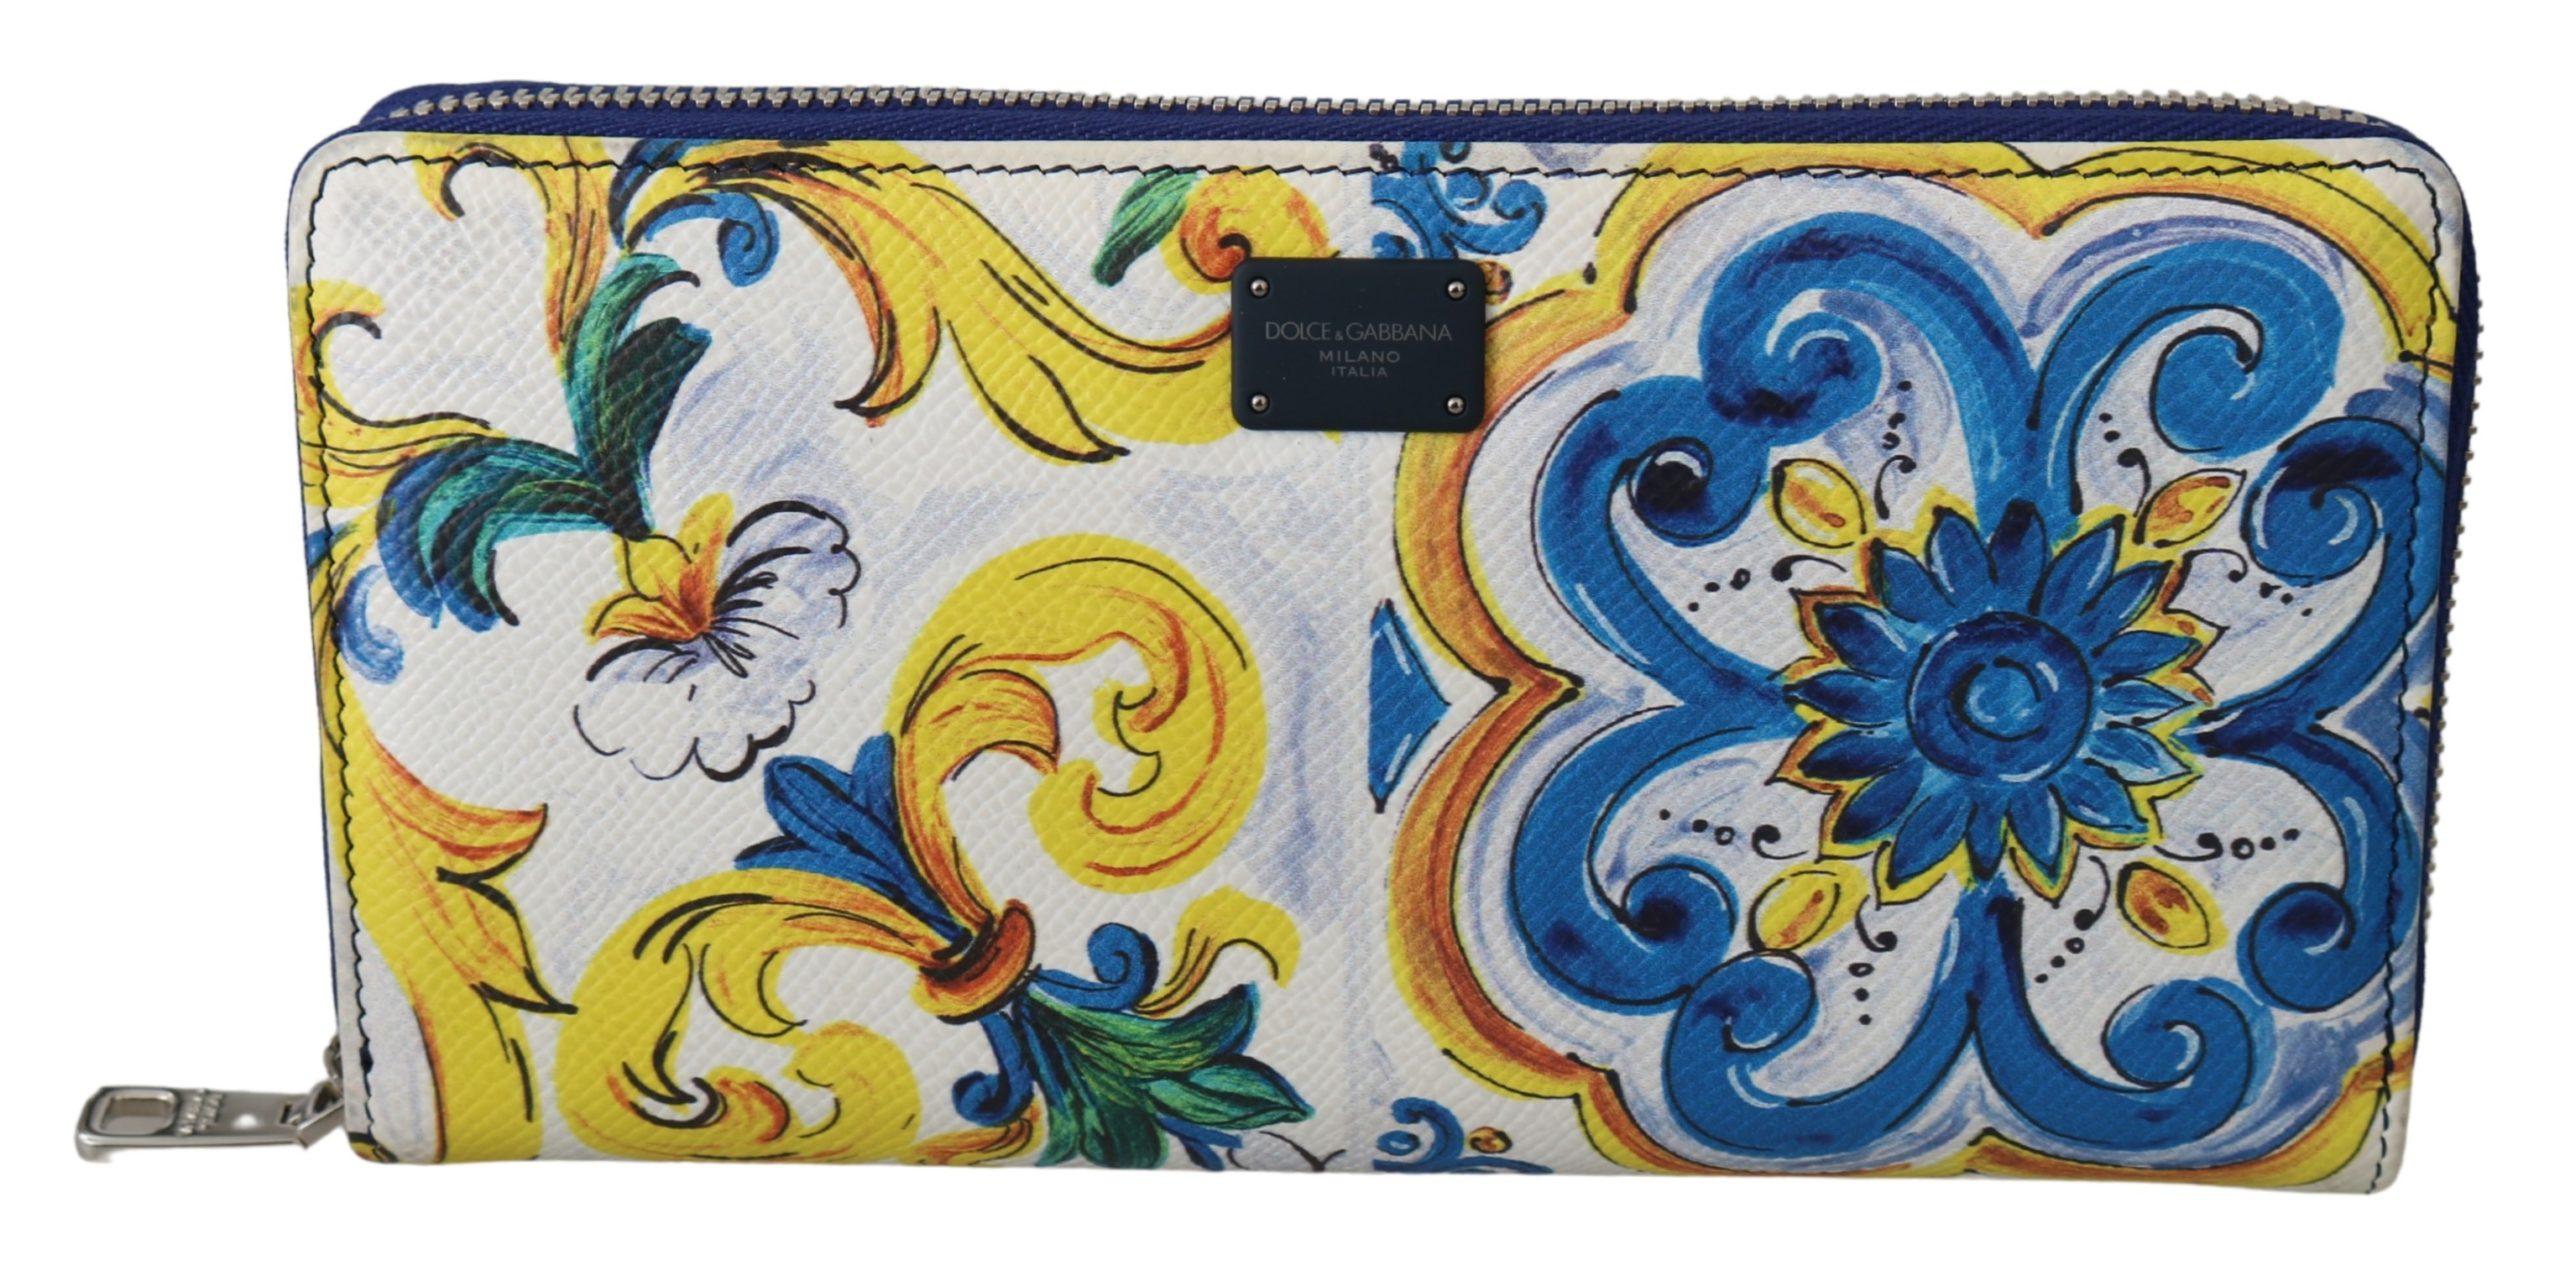 Dolce & Gabbana Men's Majolica Dauphine Leather Continental Wallet Multicolor VAS9708